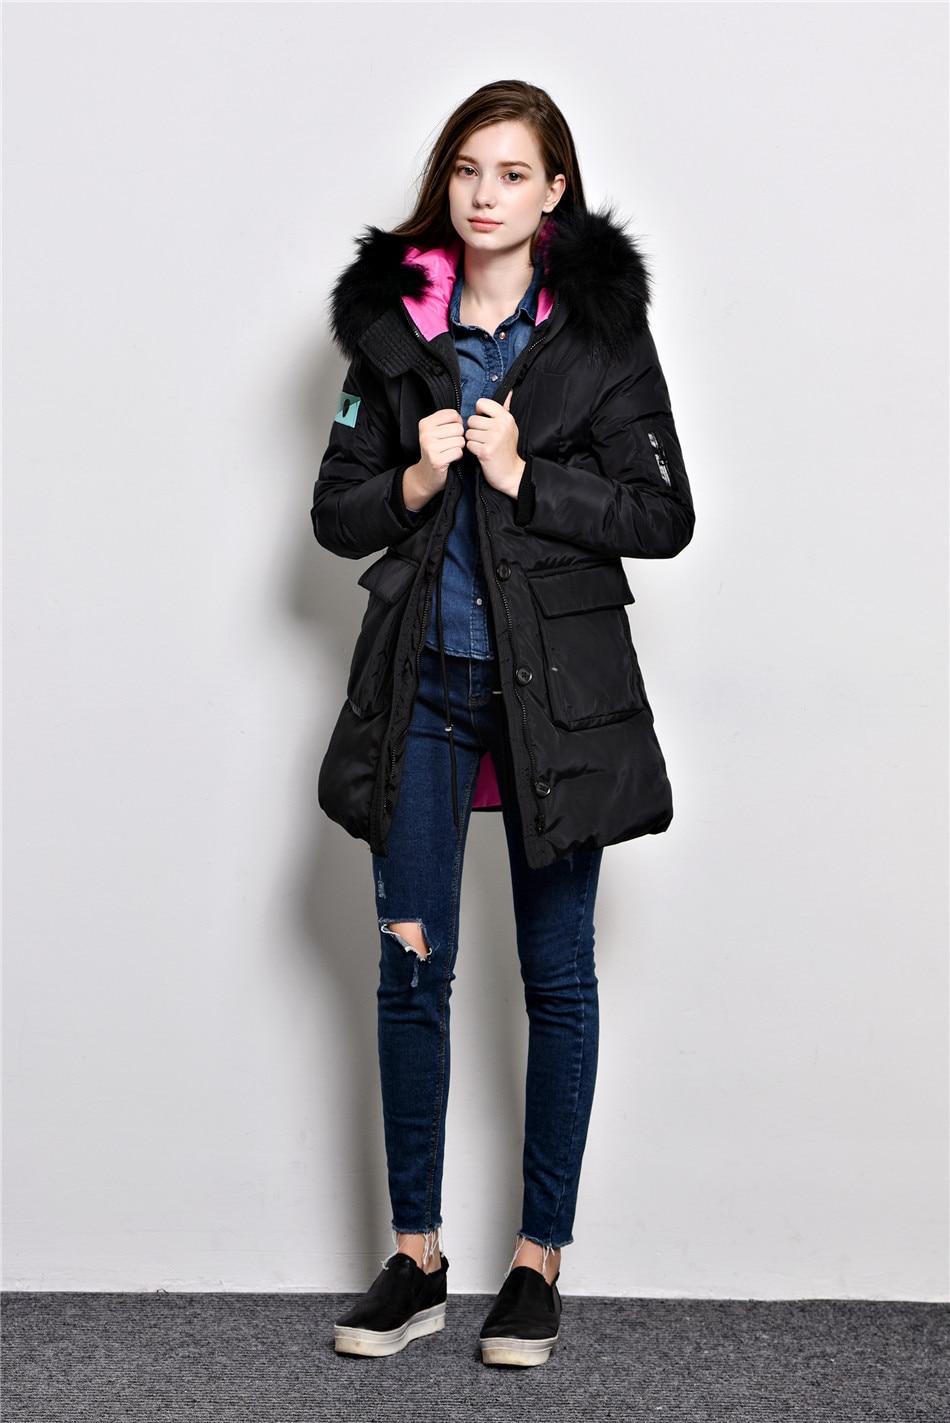 Aliexpress.com : Buy New 2015 Fashion Parkas Winter Female Down ...